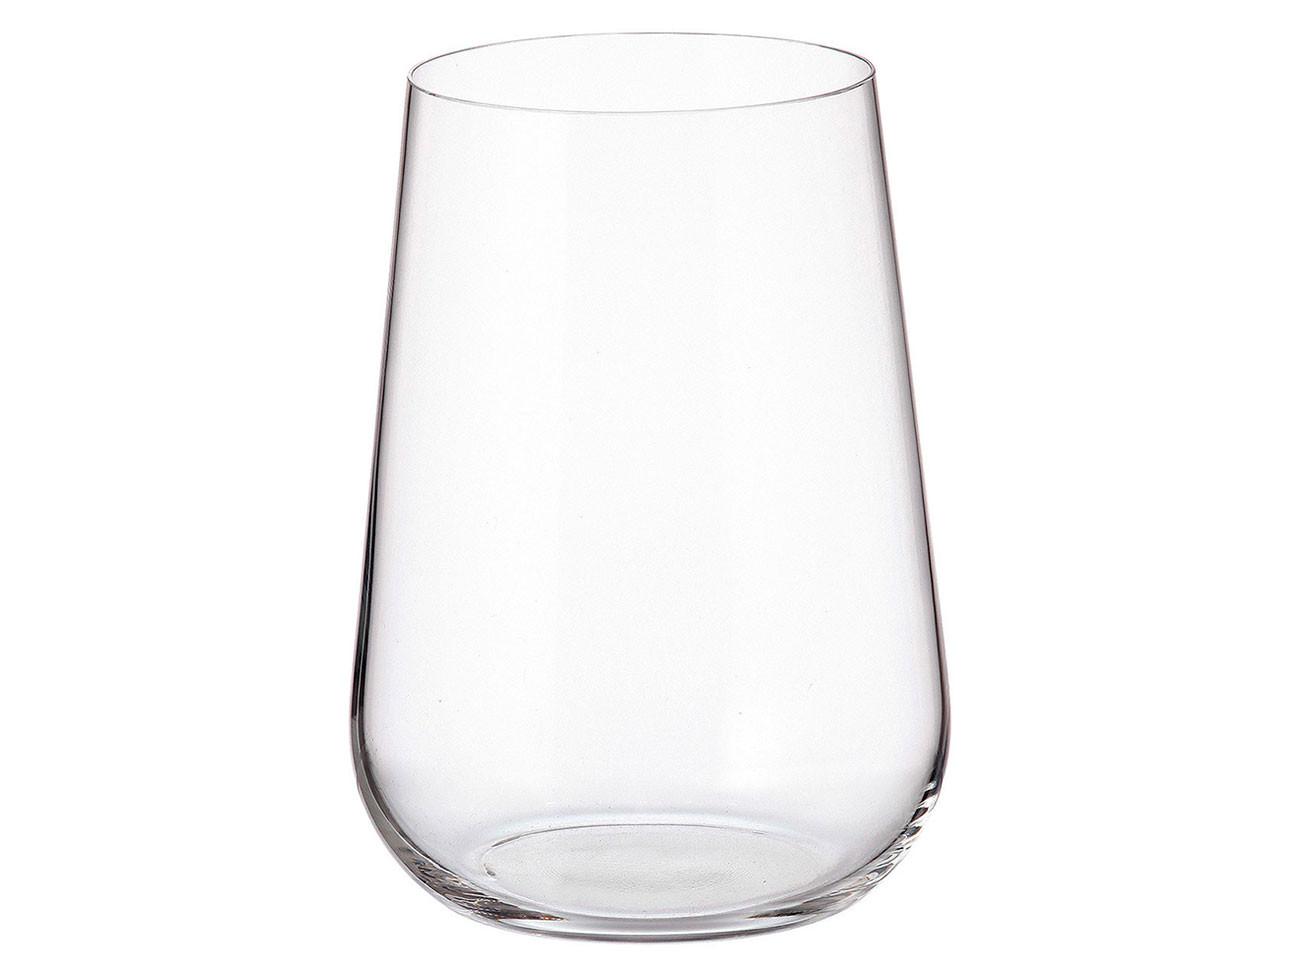 Фото - Набор стаканов Первый Мебельный Набор стаканов для воды Crystalite Bohemia Ardea/Amundsen 470 мл (6 шт) набор бокалов первый мебельный набор бокалов для вина crystalite bohemia ardea amundsen 450мл 6 шт